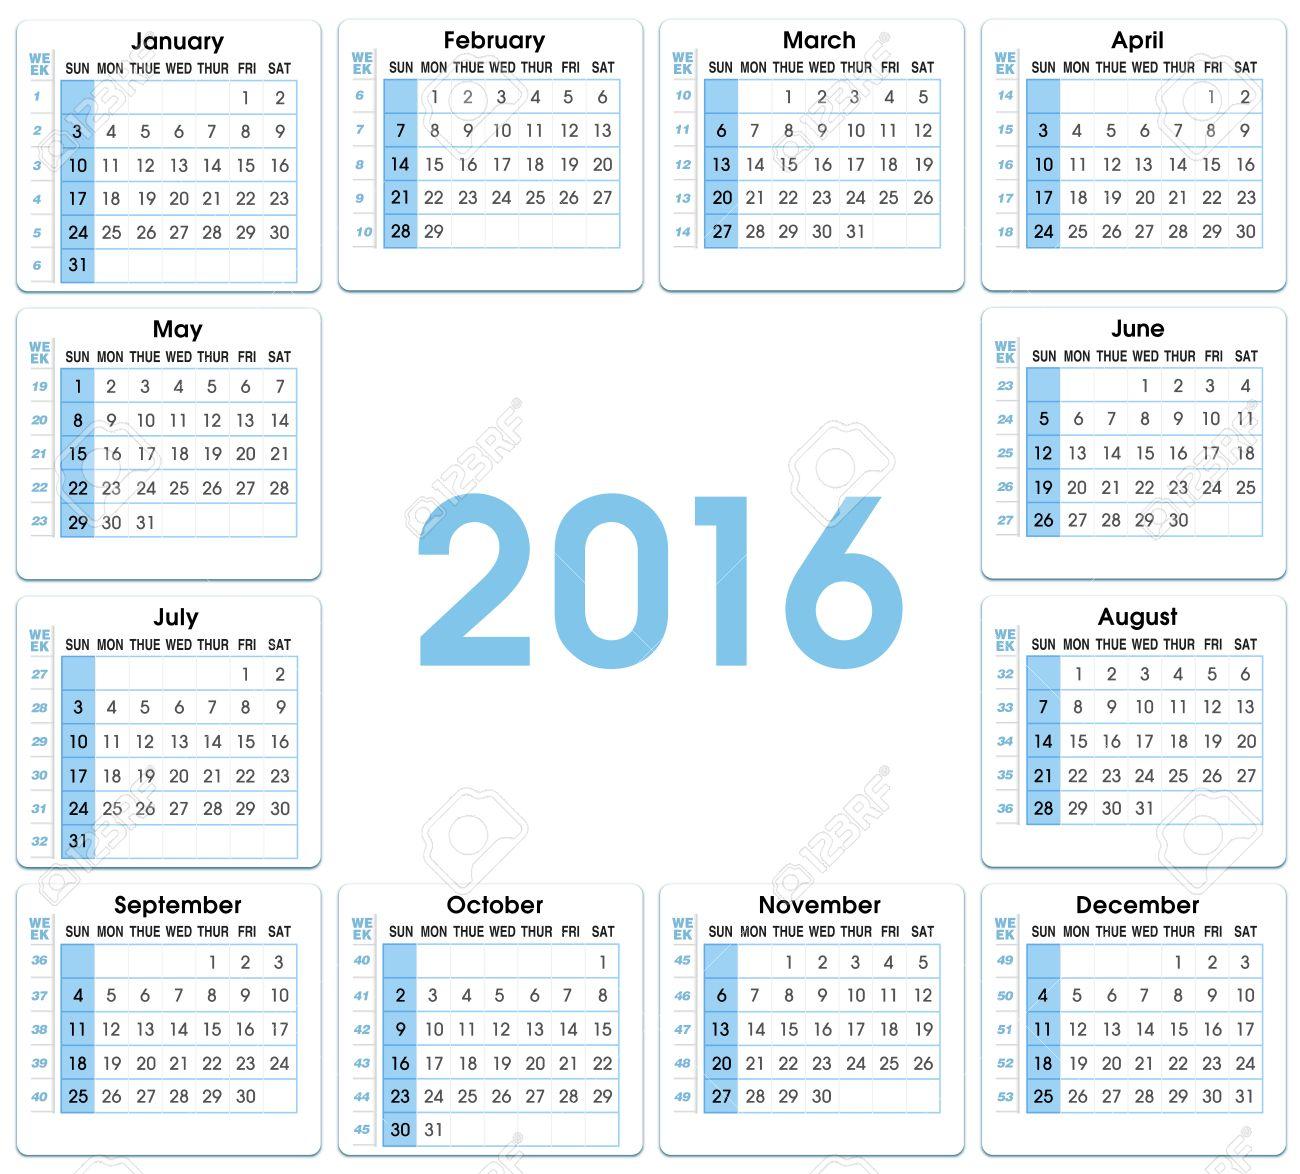 Calendrier Avec Numero Semaine.Calendrier 2016 12 Mois En Indiquant Le Numero Des Semaines 2016 Calendrier Avec Semaines Carre De Format